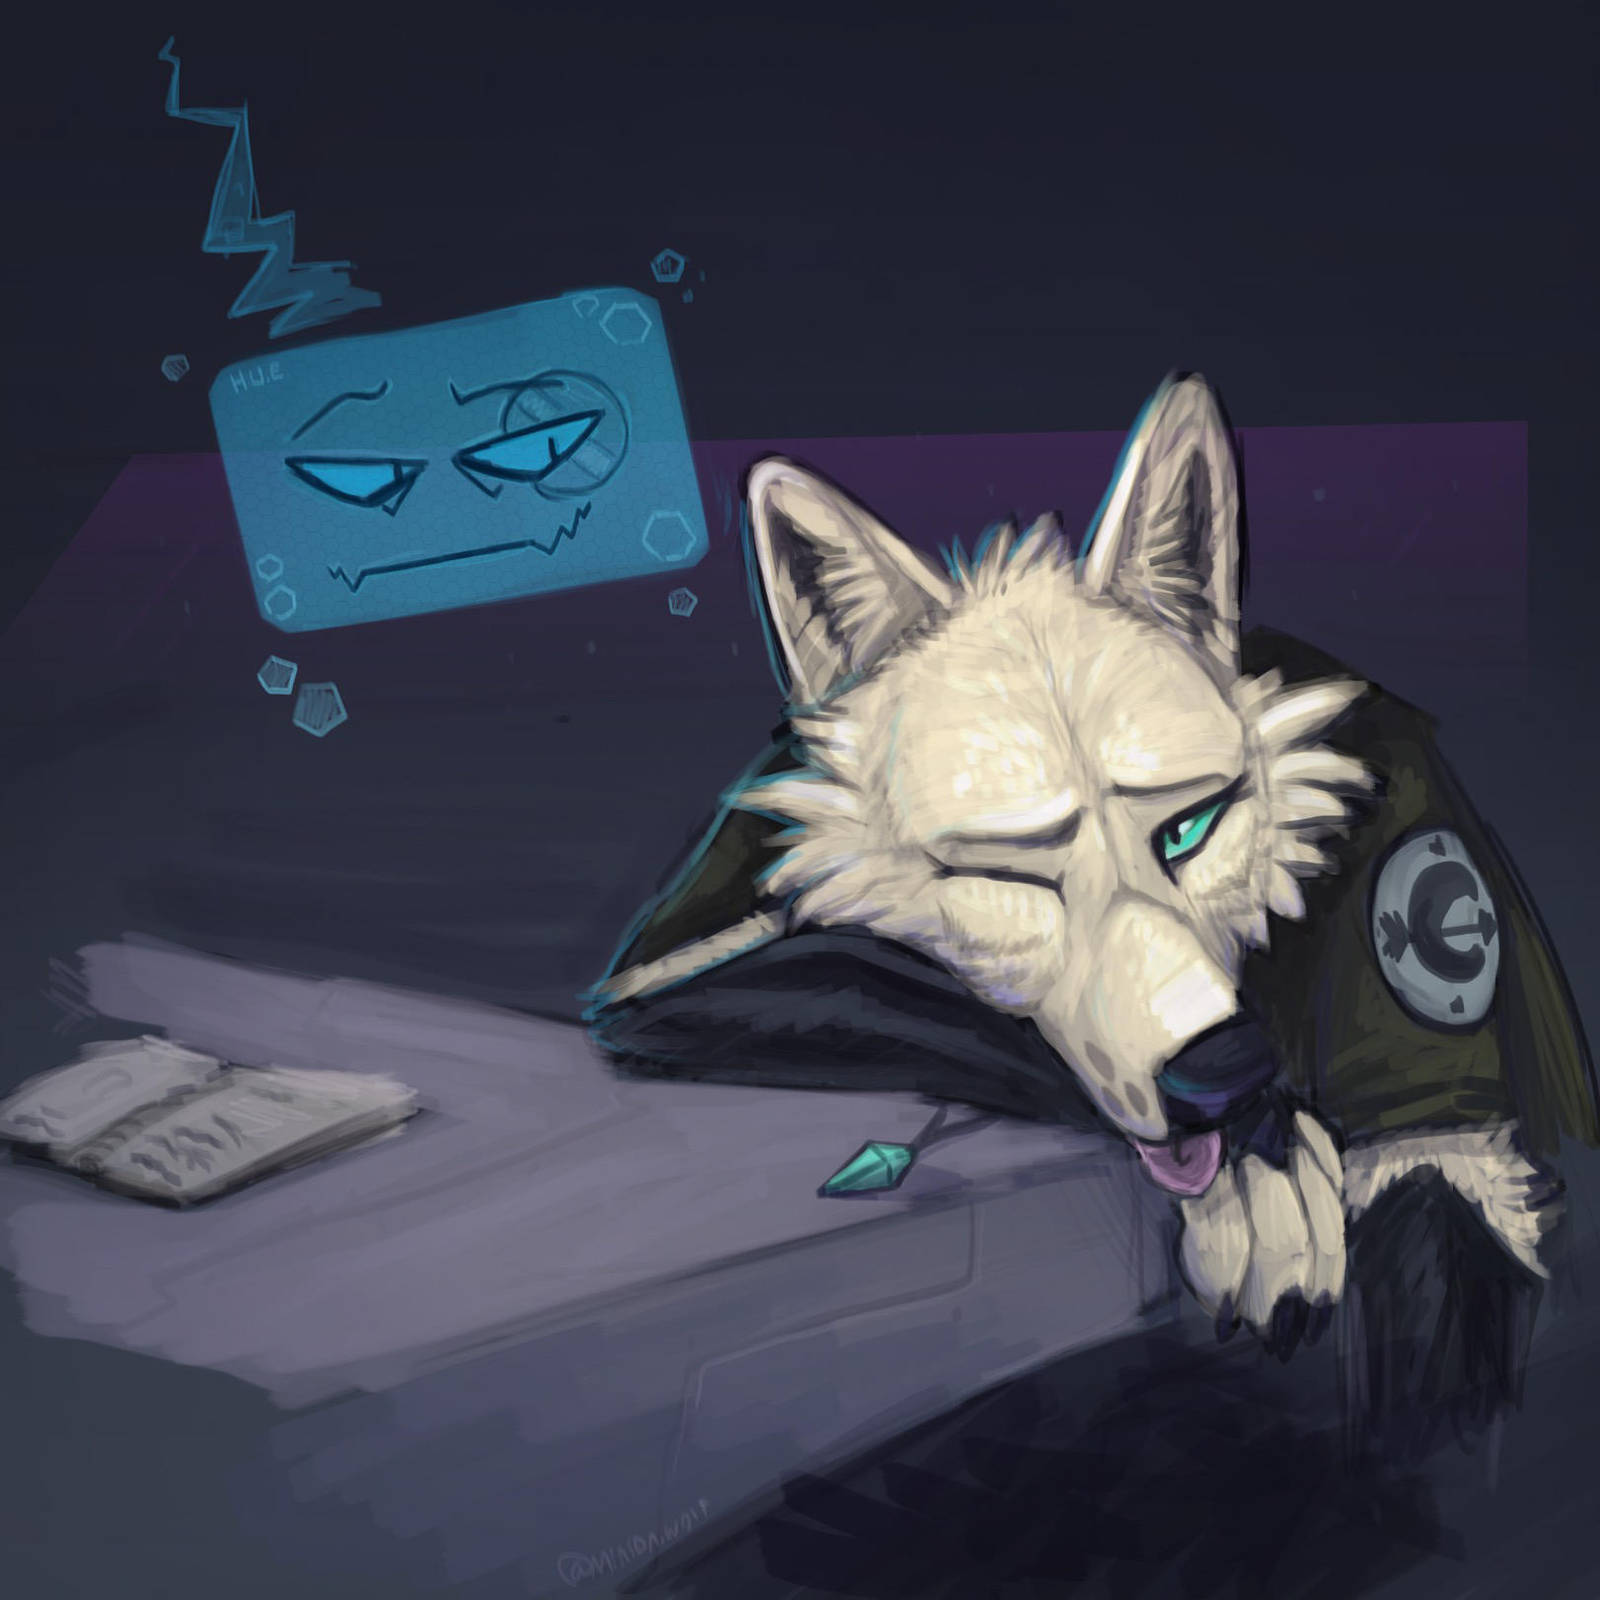 huehh by Minionwolf711